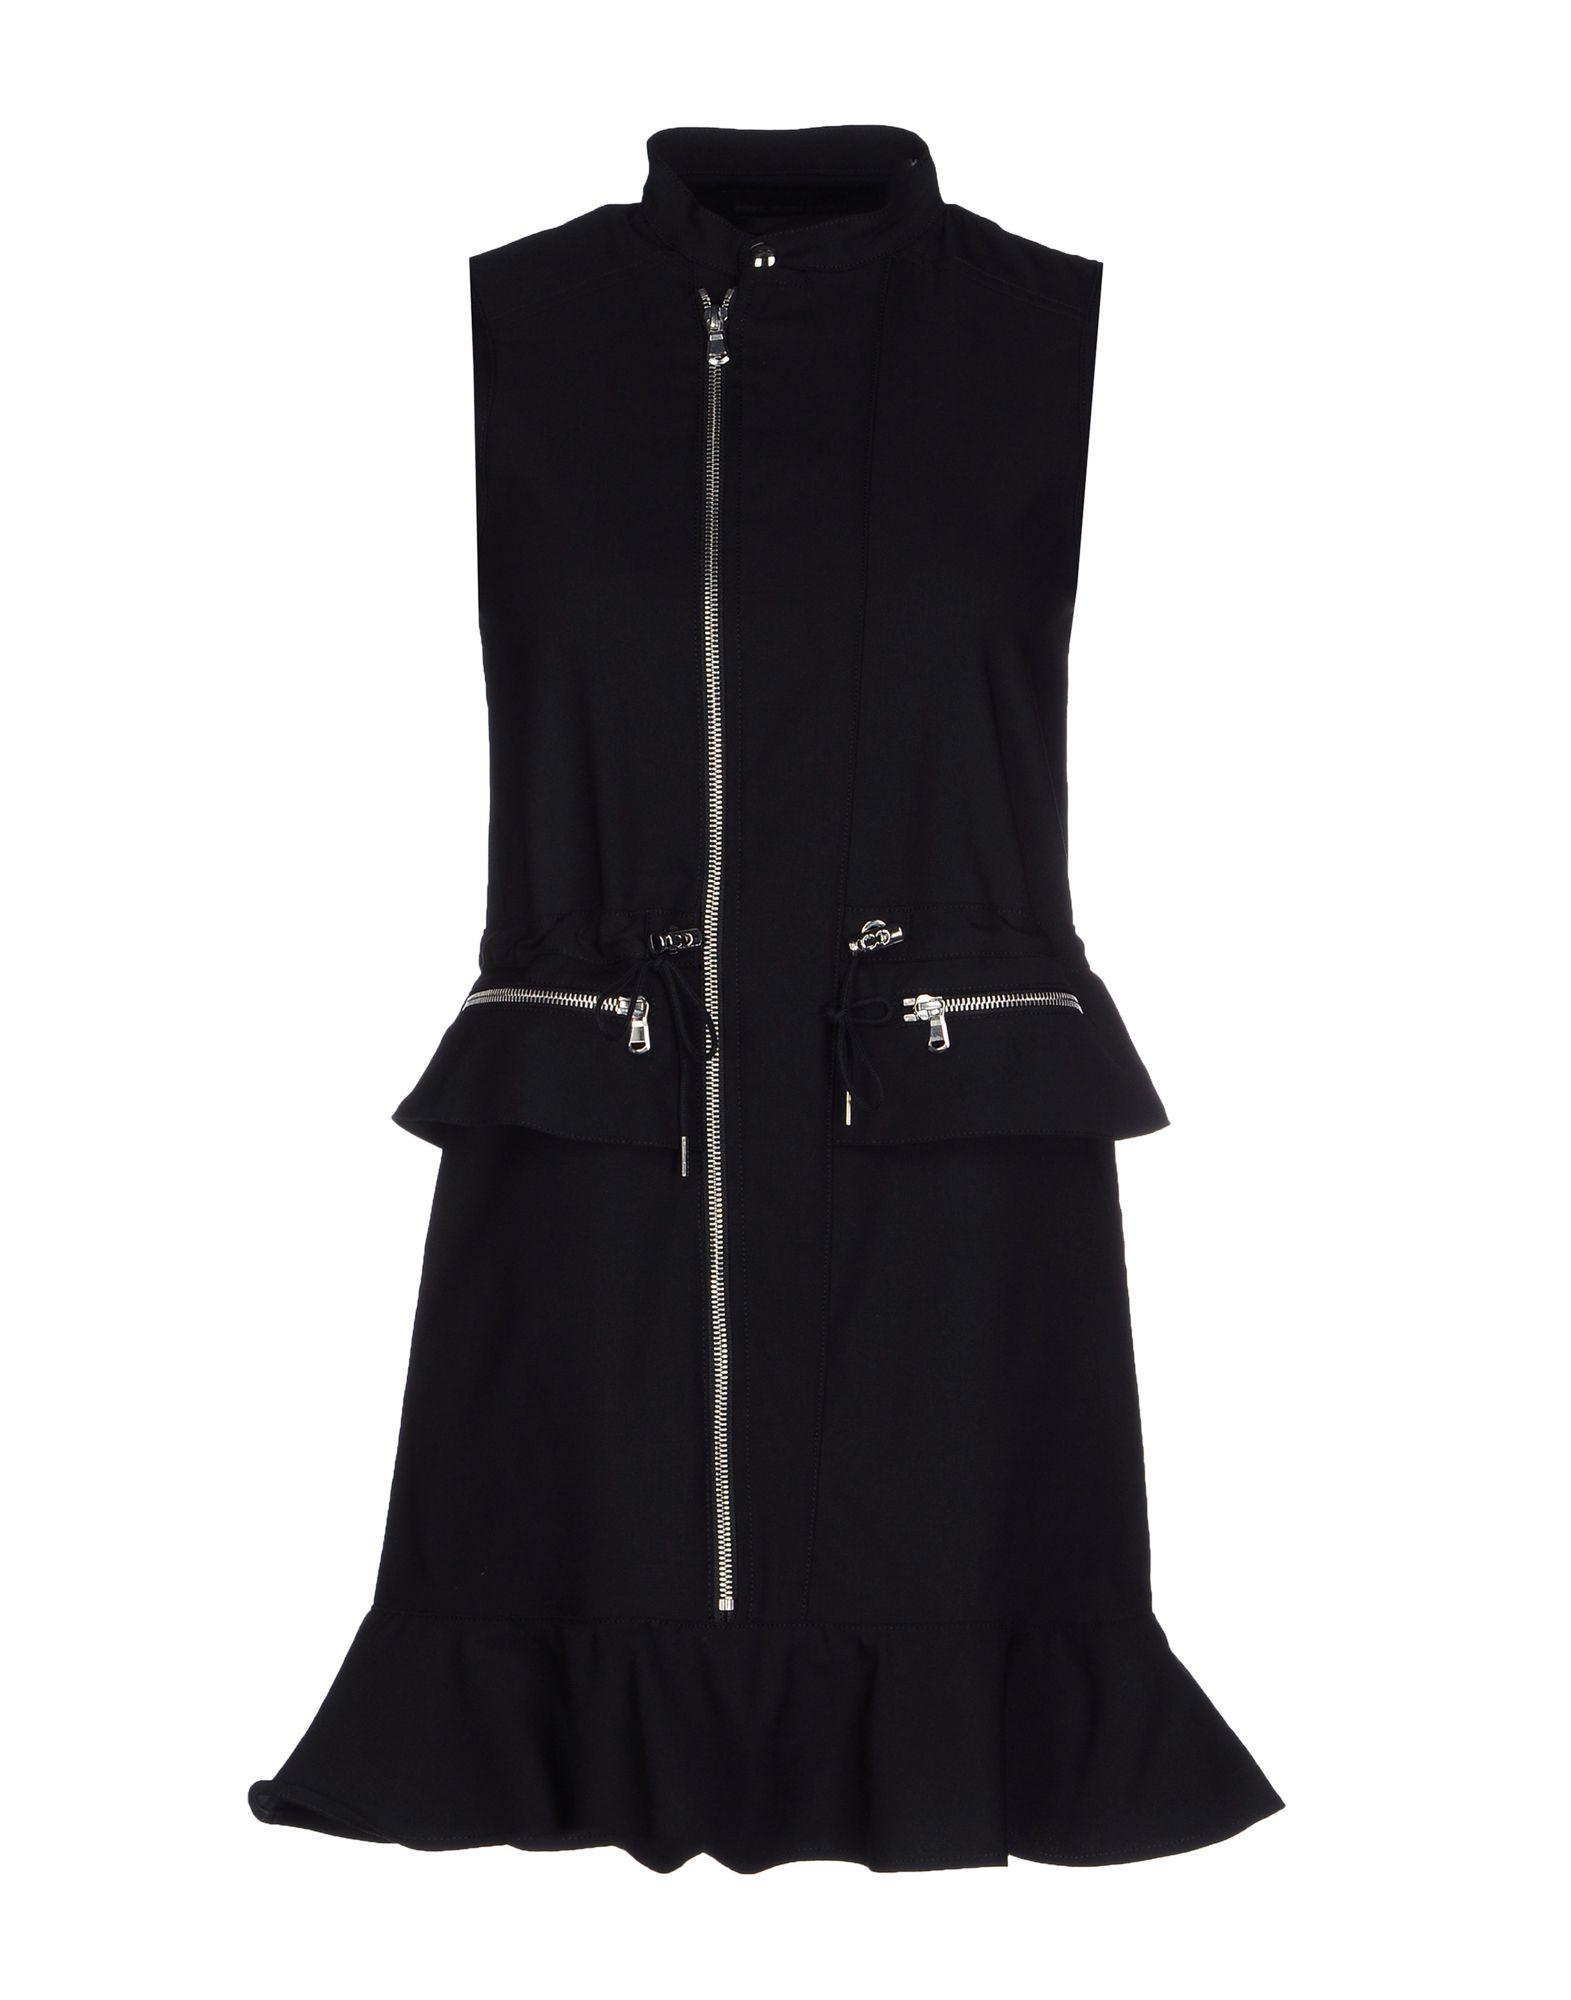 Black and Gold Short Dresses